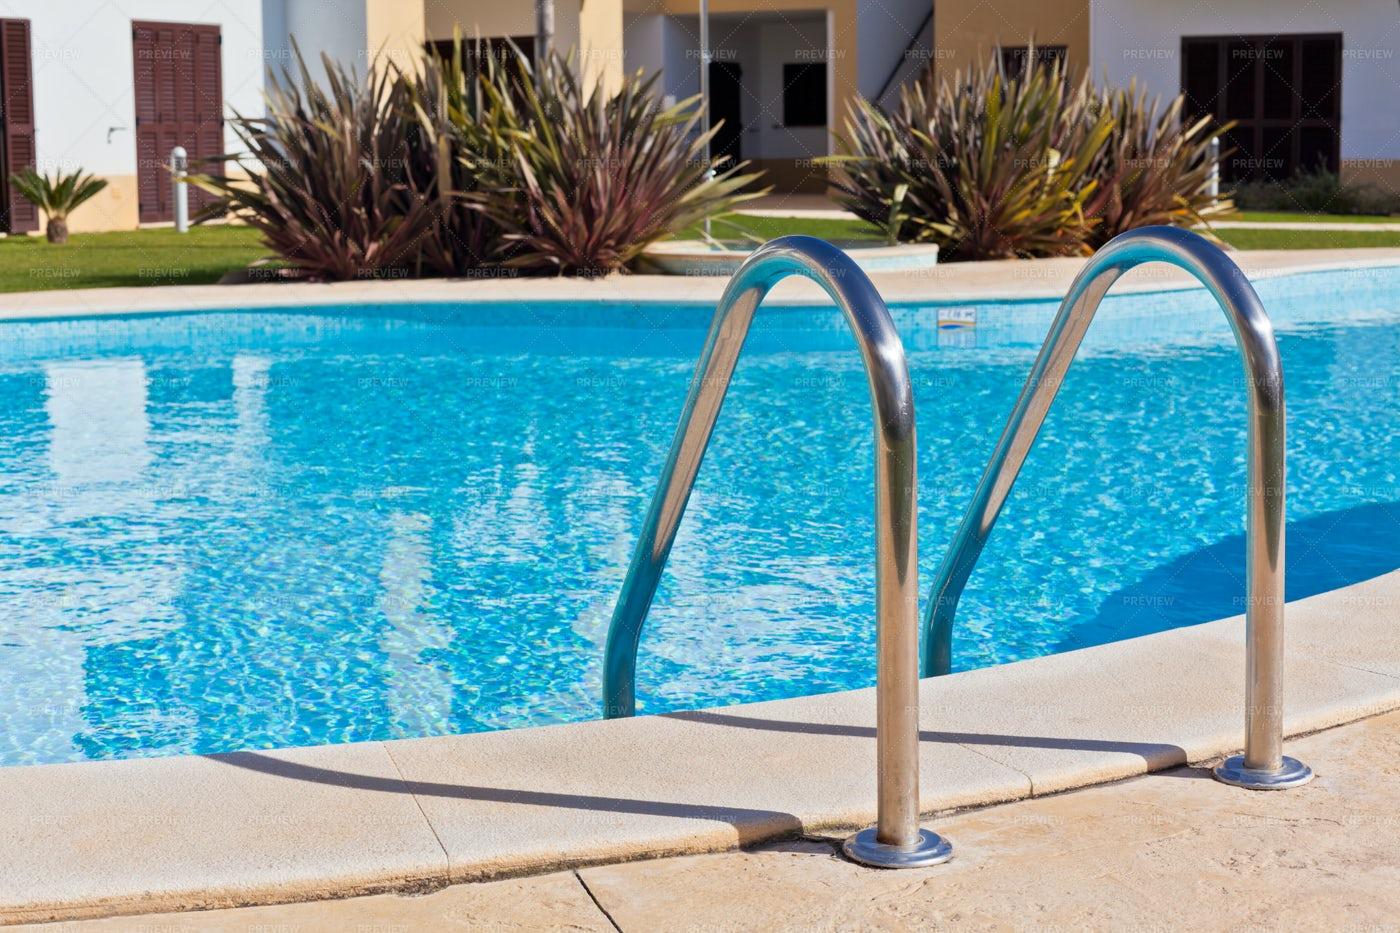 Outdoor Swimming Pool: Stock Photos